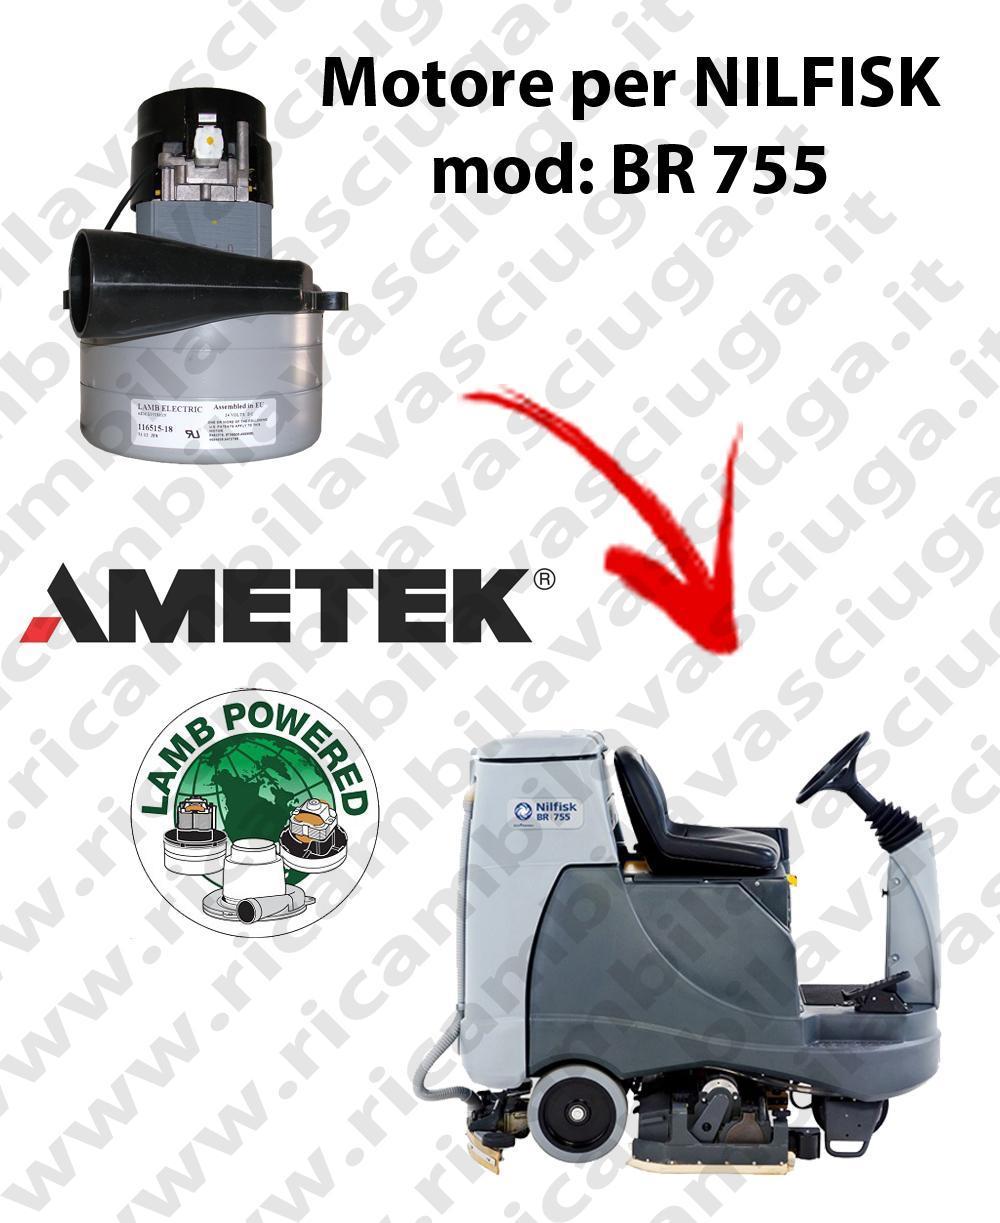 BR 755 Saugmotor LAMB AMETEK für scheuersaugmaschinen NILFISK